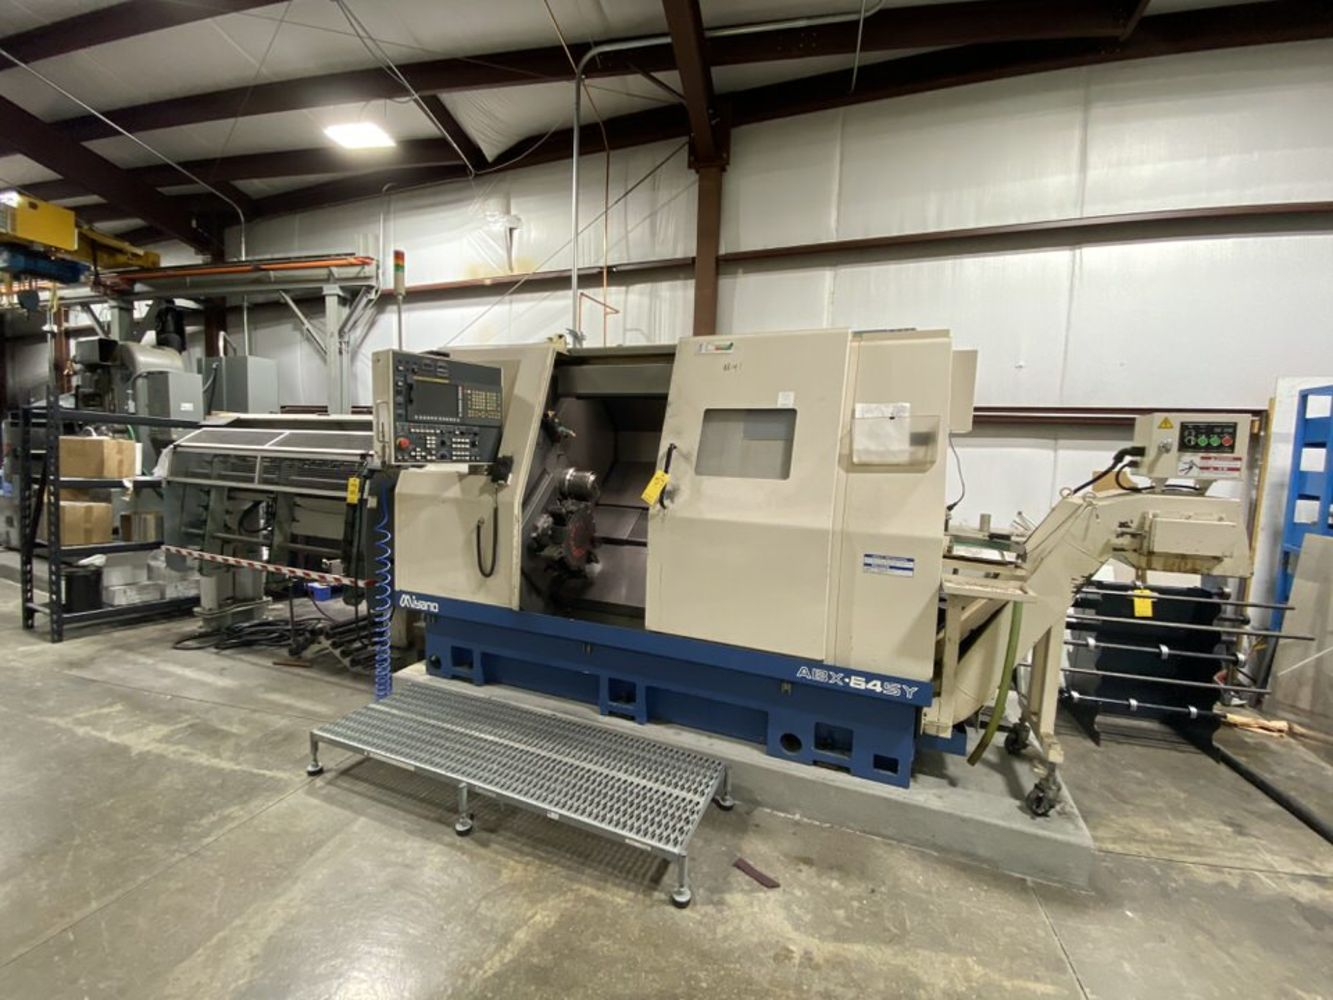 Ultra Clean R&D CNC Machine Shop & Drilling Equipment